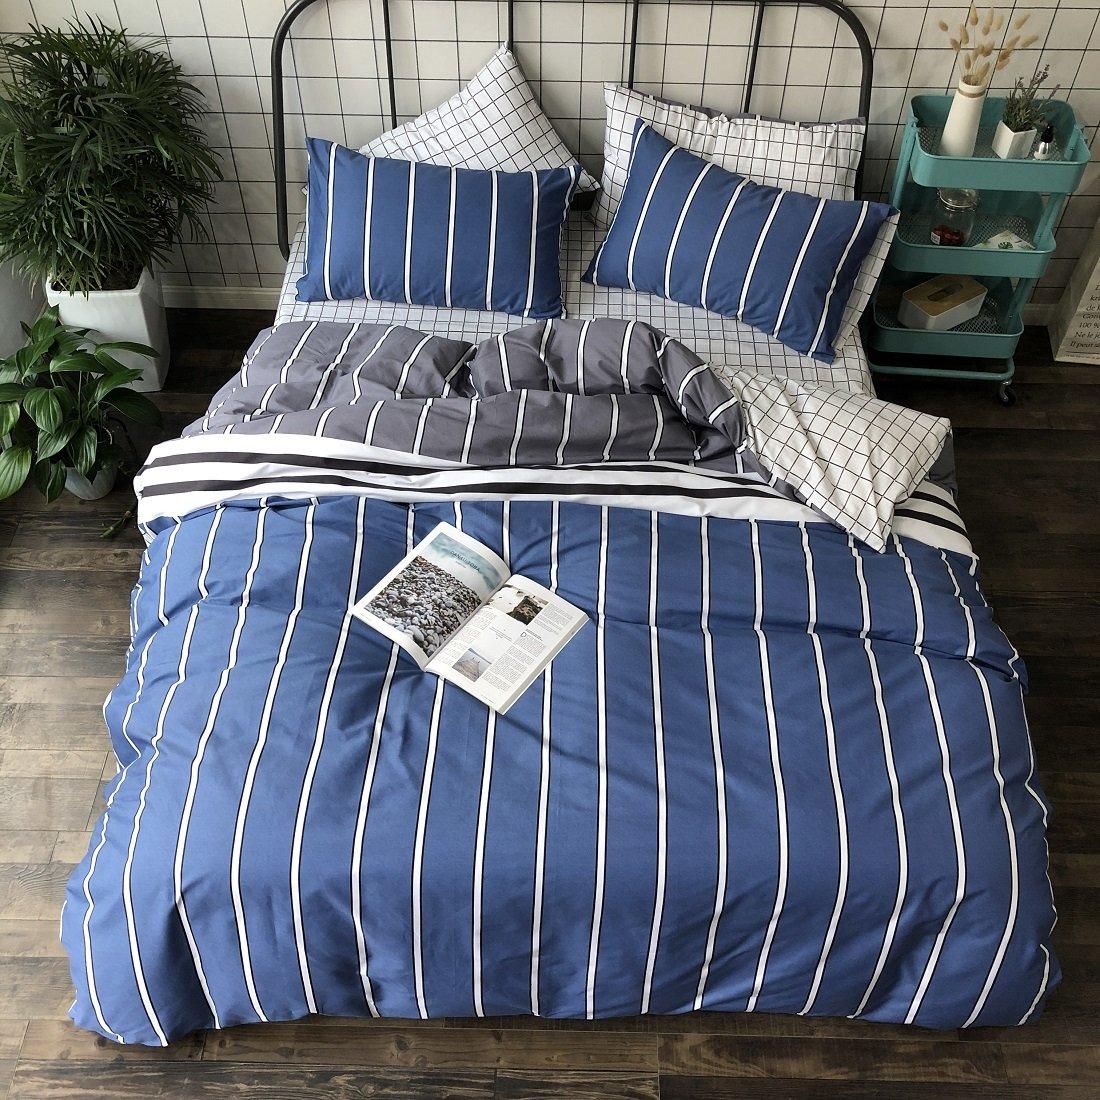 Jane yre Geometric Blue Stripe Pattern Duvet Cover Set Queen Size 100 Cotton Comforter Luxury 3 Piece Stripe Bedding Sets Full Size Reversible Duvet Cover Set White with Hidden Zipper